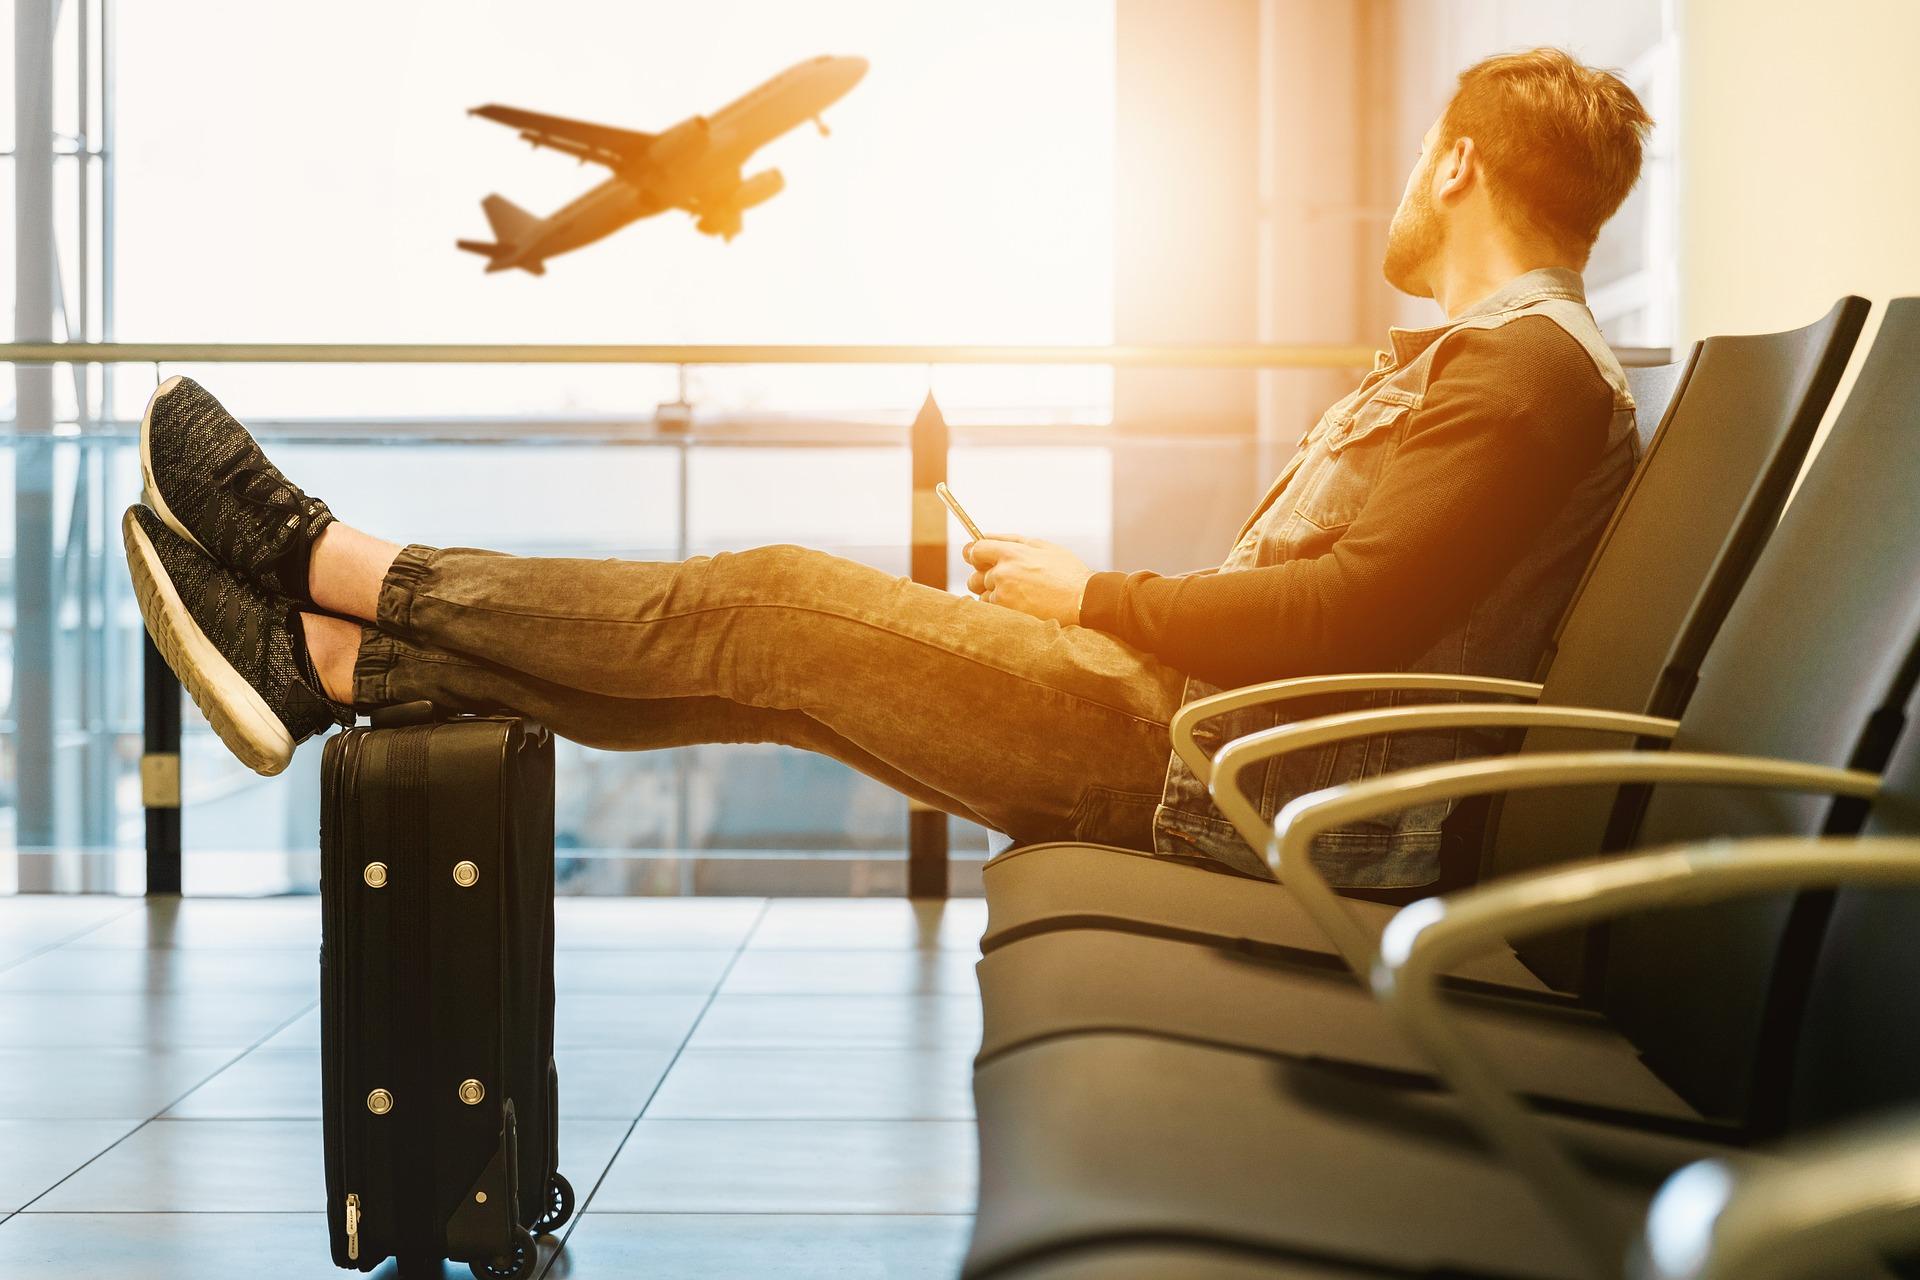 Harkivśkyj aeroport pereveršyv vlasnyj rekord pasažyropotoku